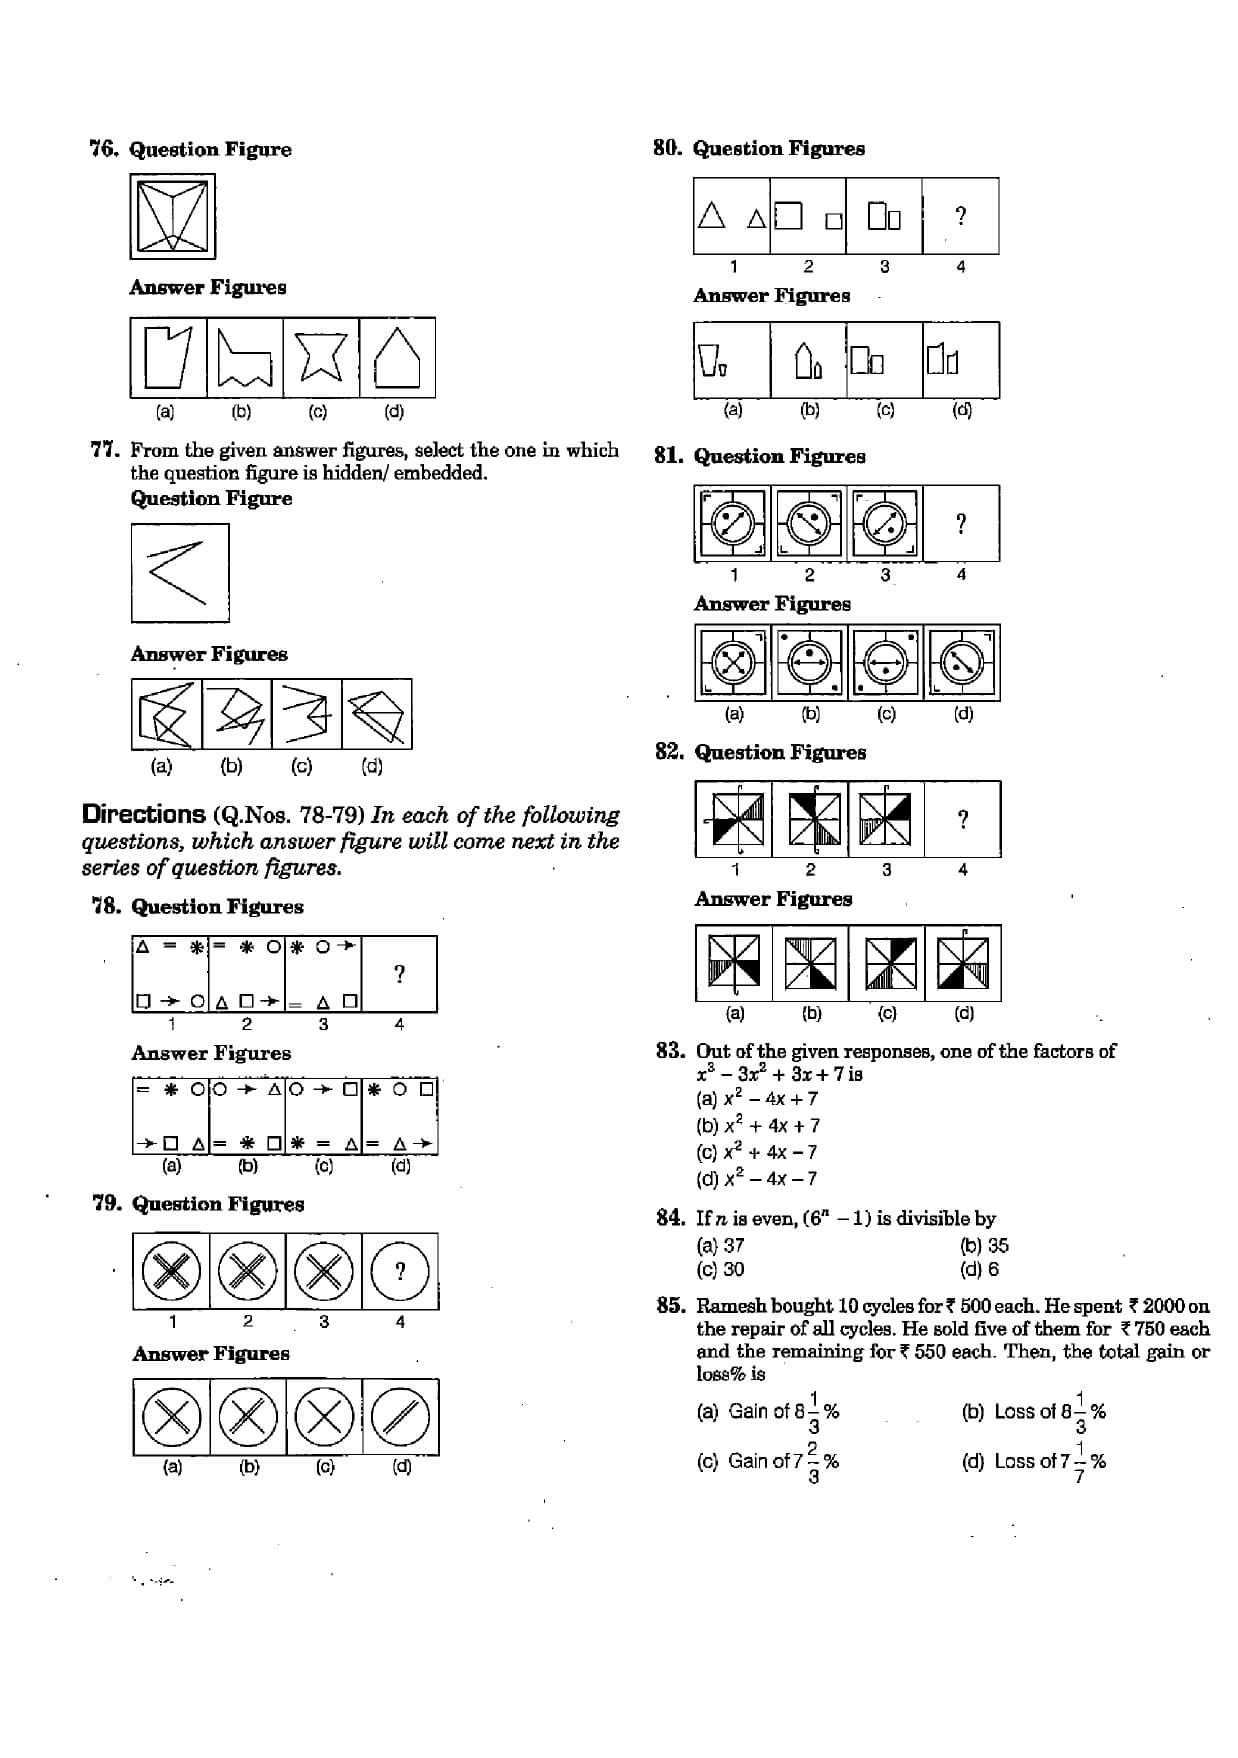 AFCAT 1 2020 Question Paper 06